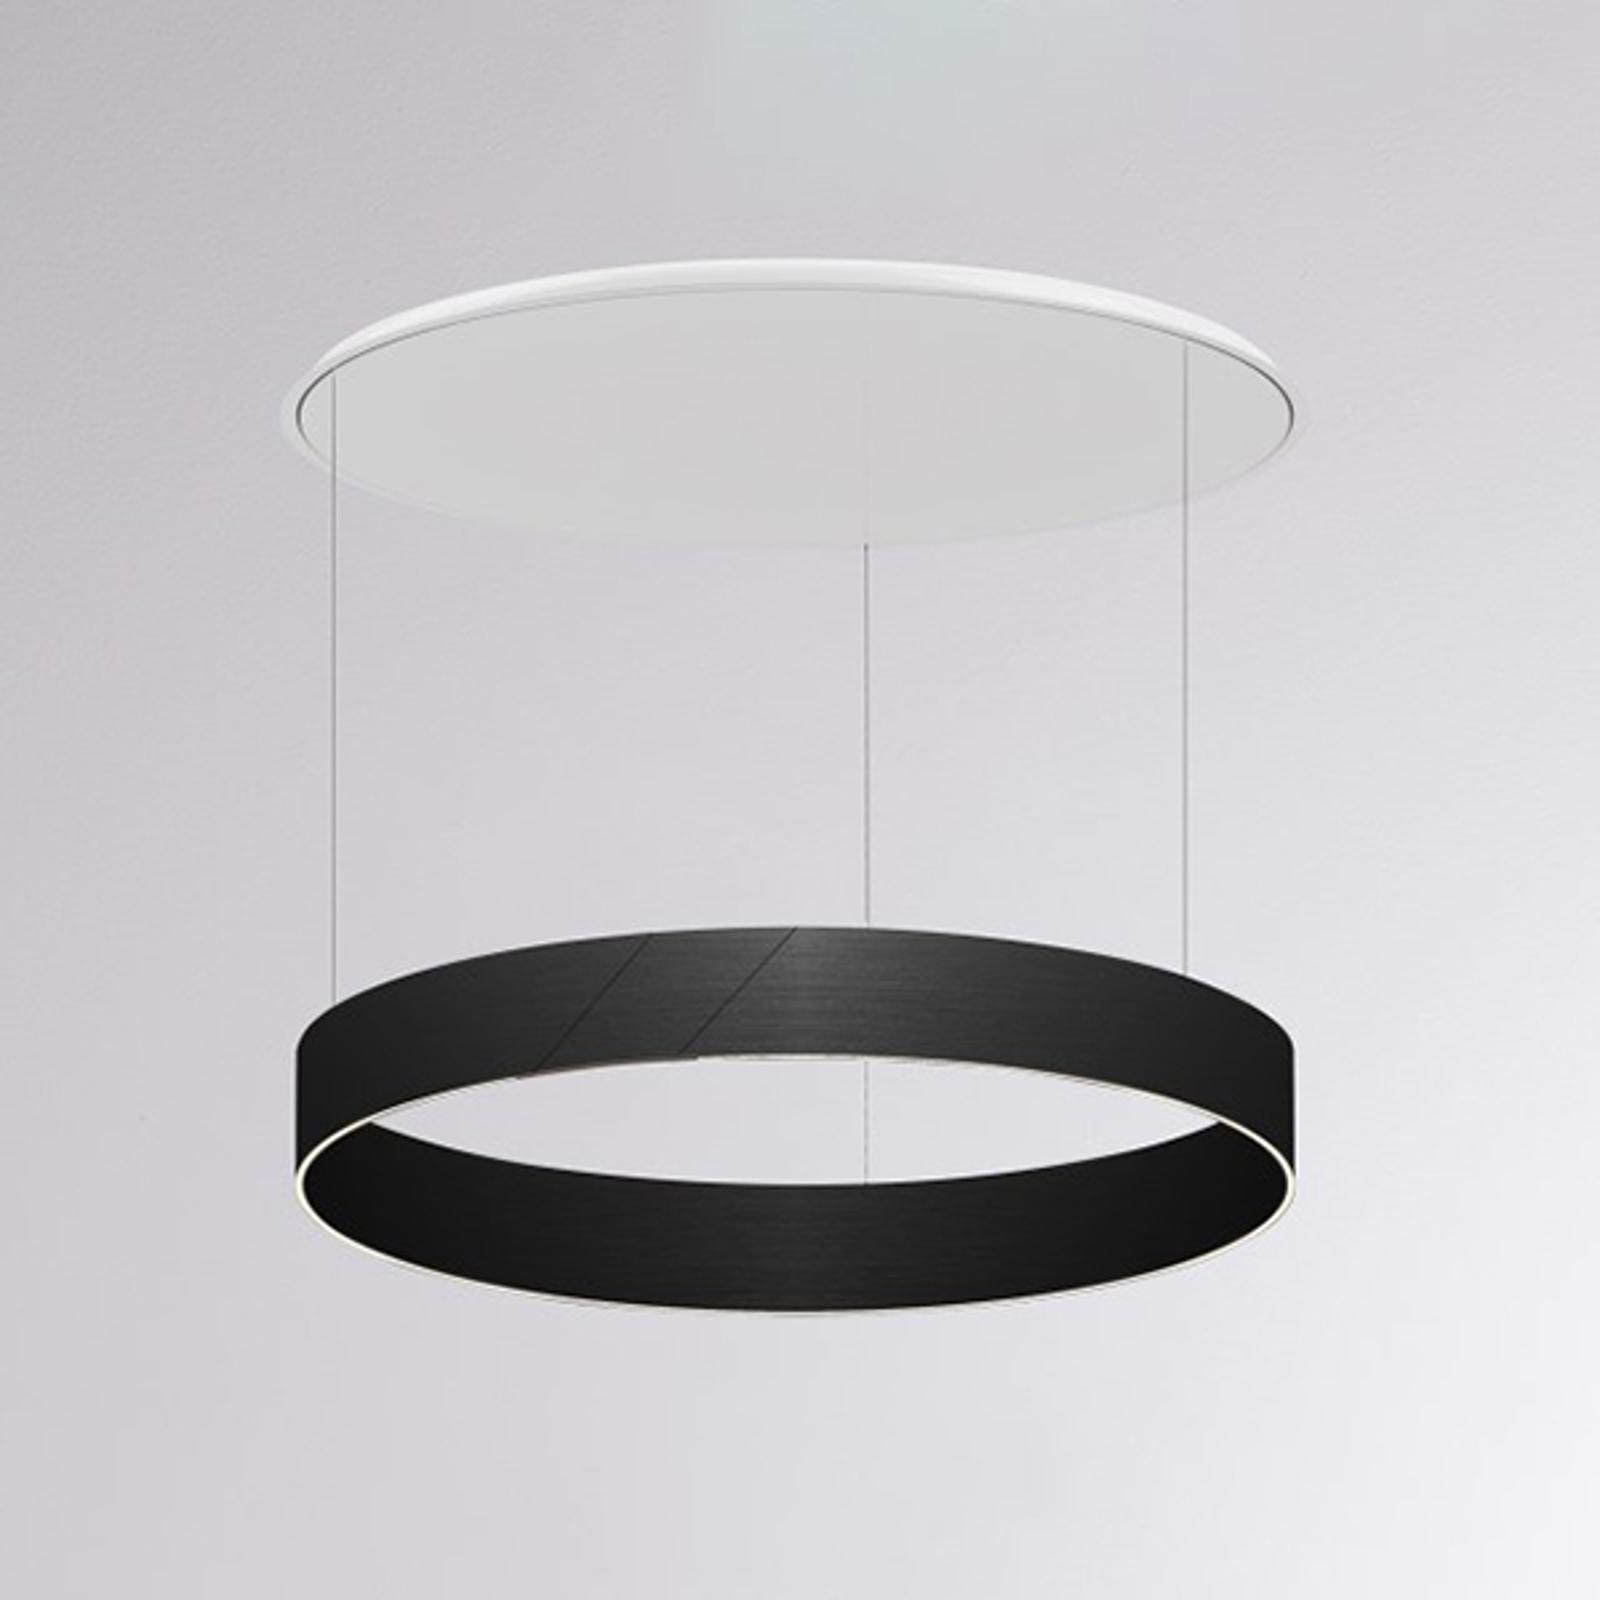 Suspension LED After 8 Round DALI 3000K noire